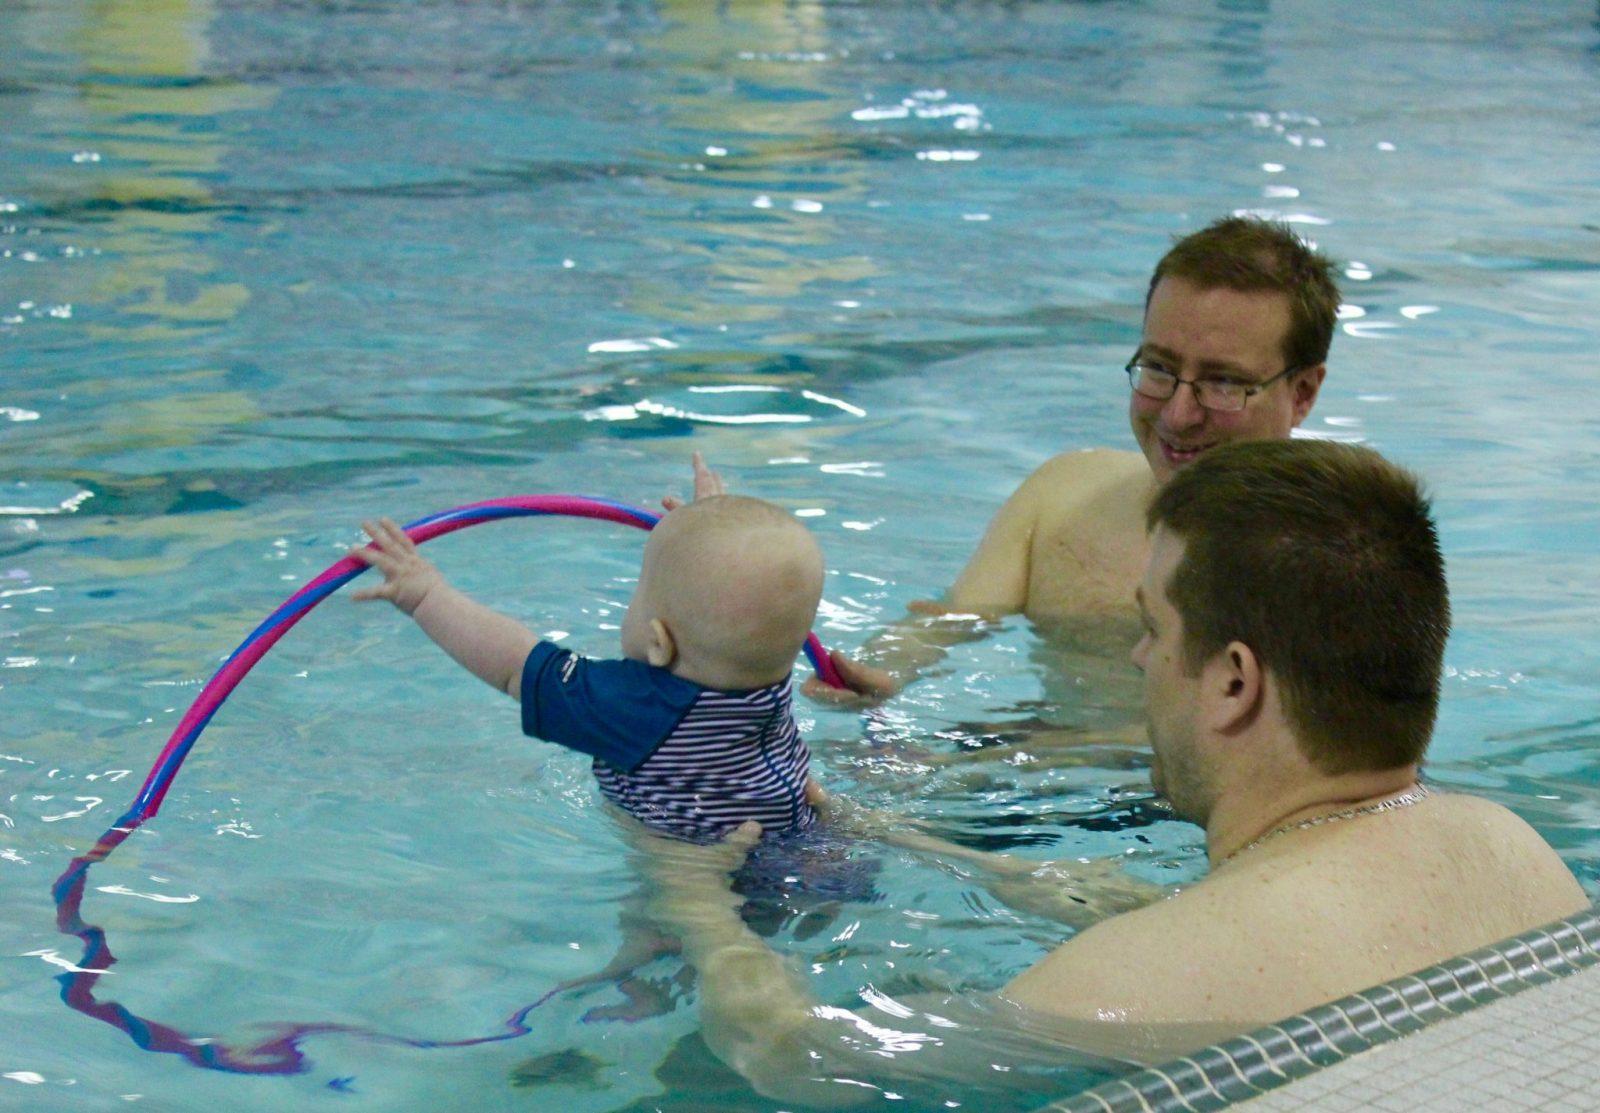 cours de piscine : 50 au-bambin: Source Cynthia